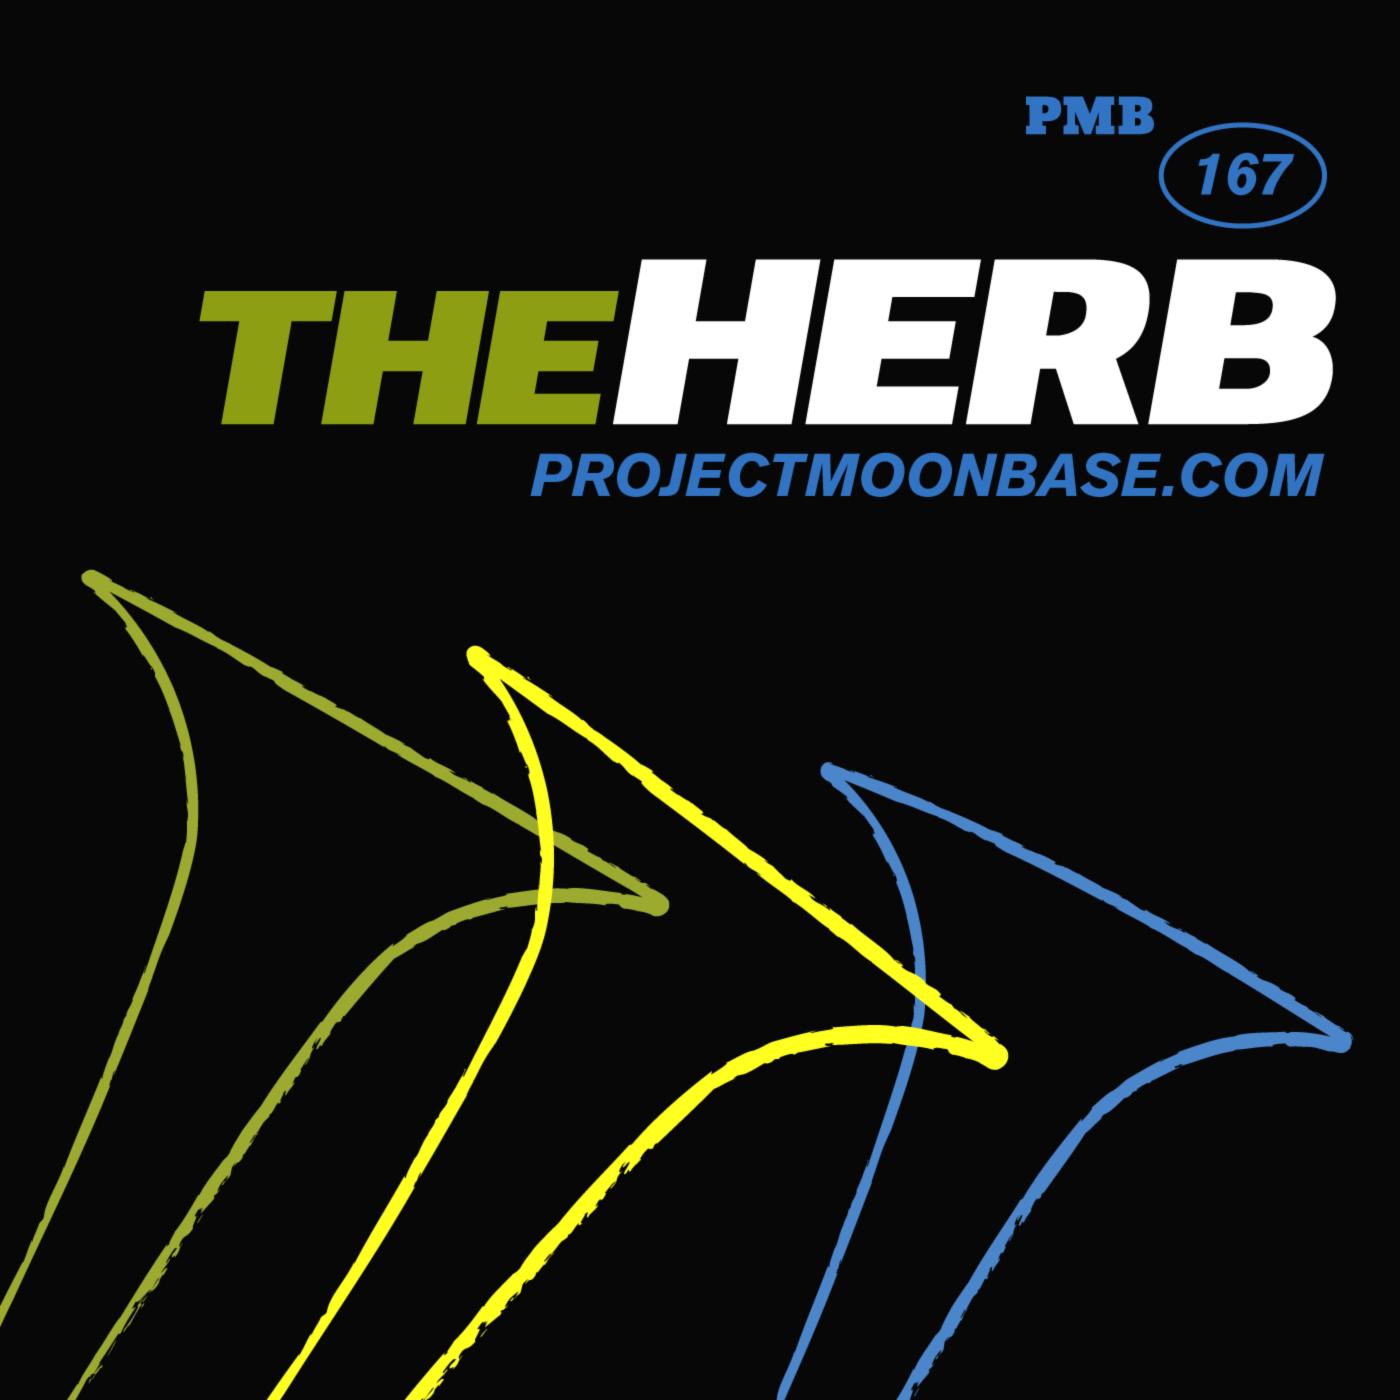 PMB167 The Herb